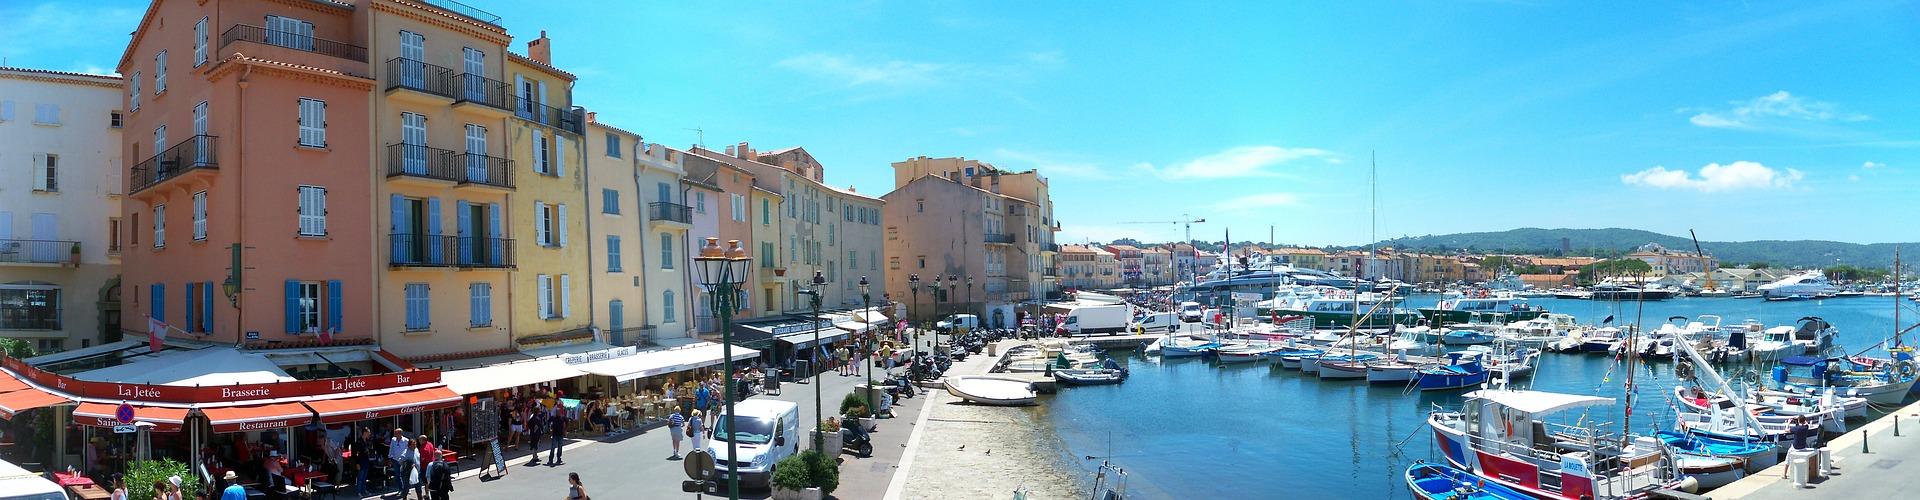 Shopping Saint Tropez Smartour Riviera